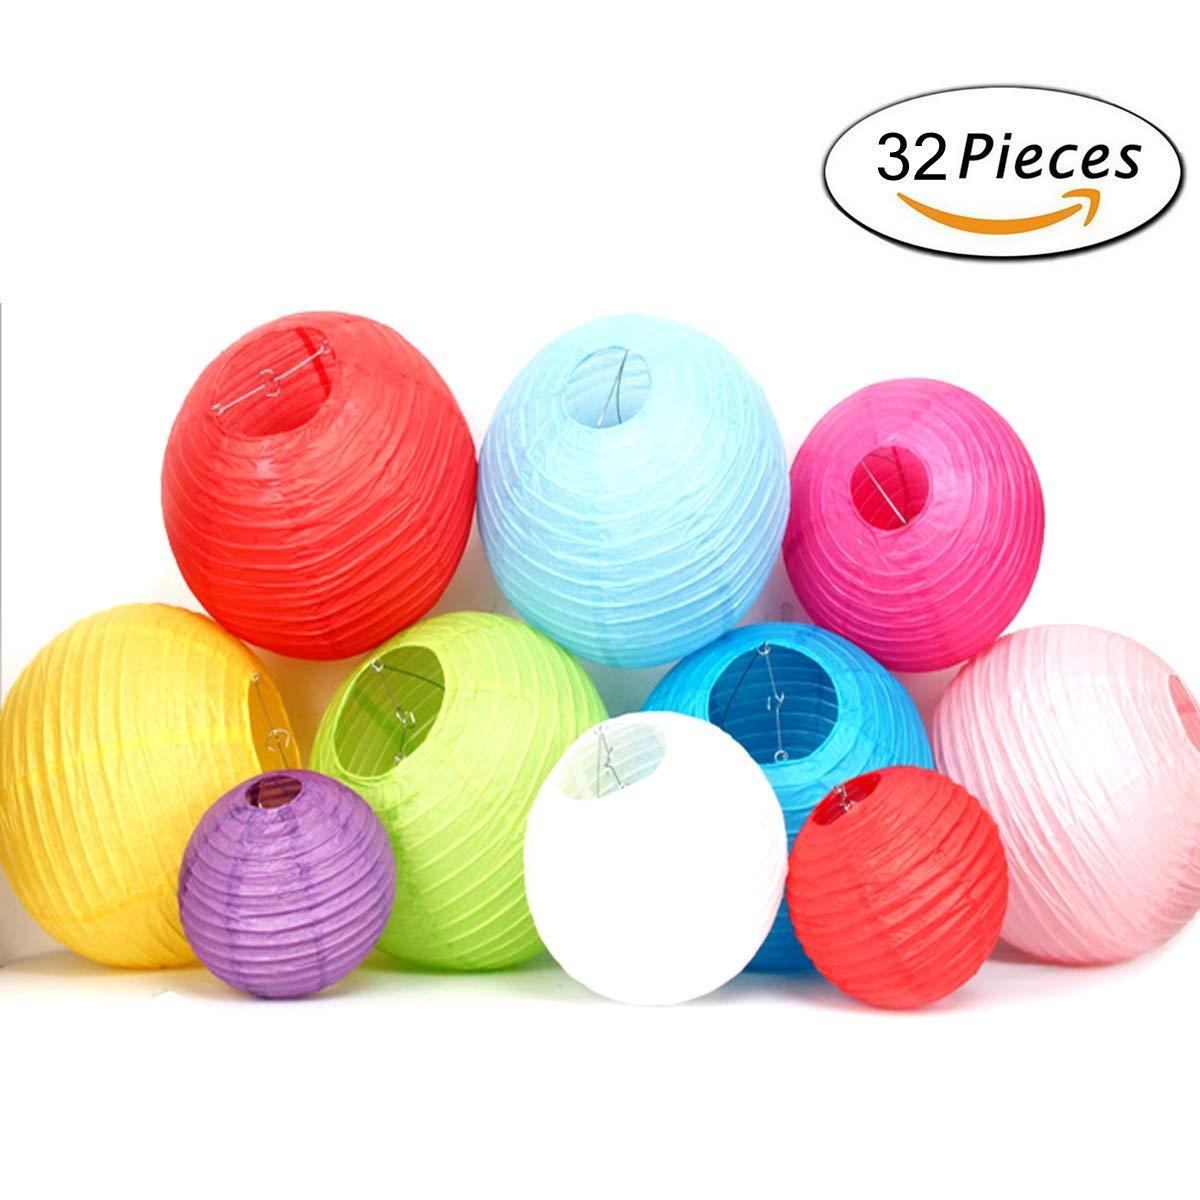 GPARK 36PCS Rainbow Color Paper Lanterns 4 Colors, (Multicolor, Size of 4'', 6'', 8'', 10'') for Wedding Birthday Party Graduation Home Decoration